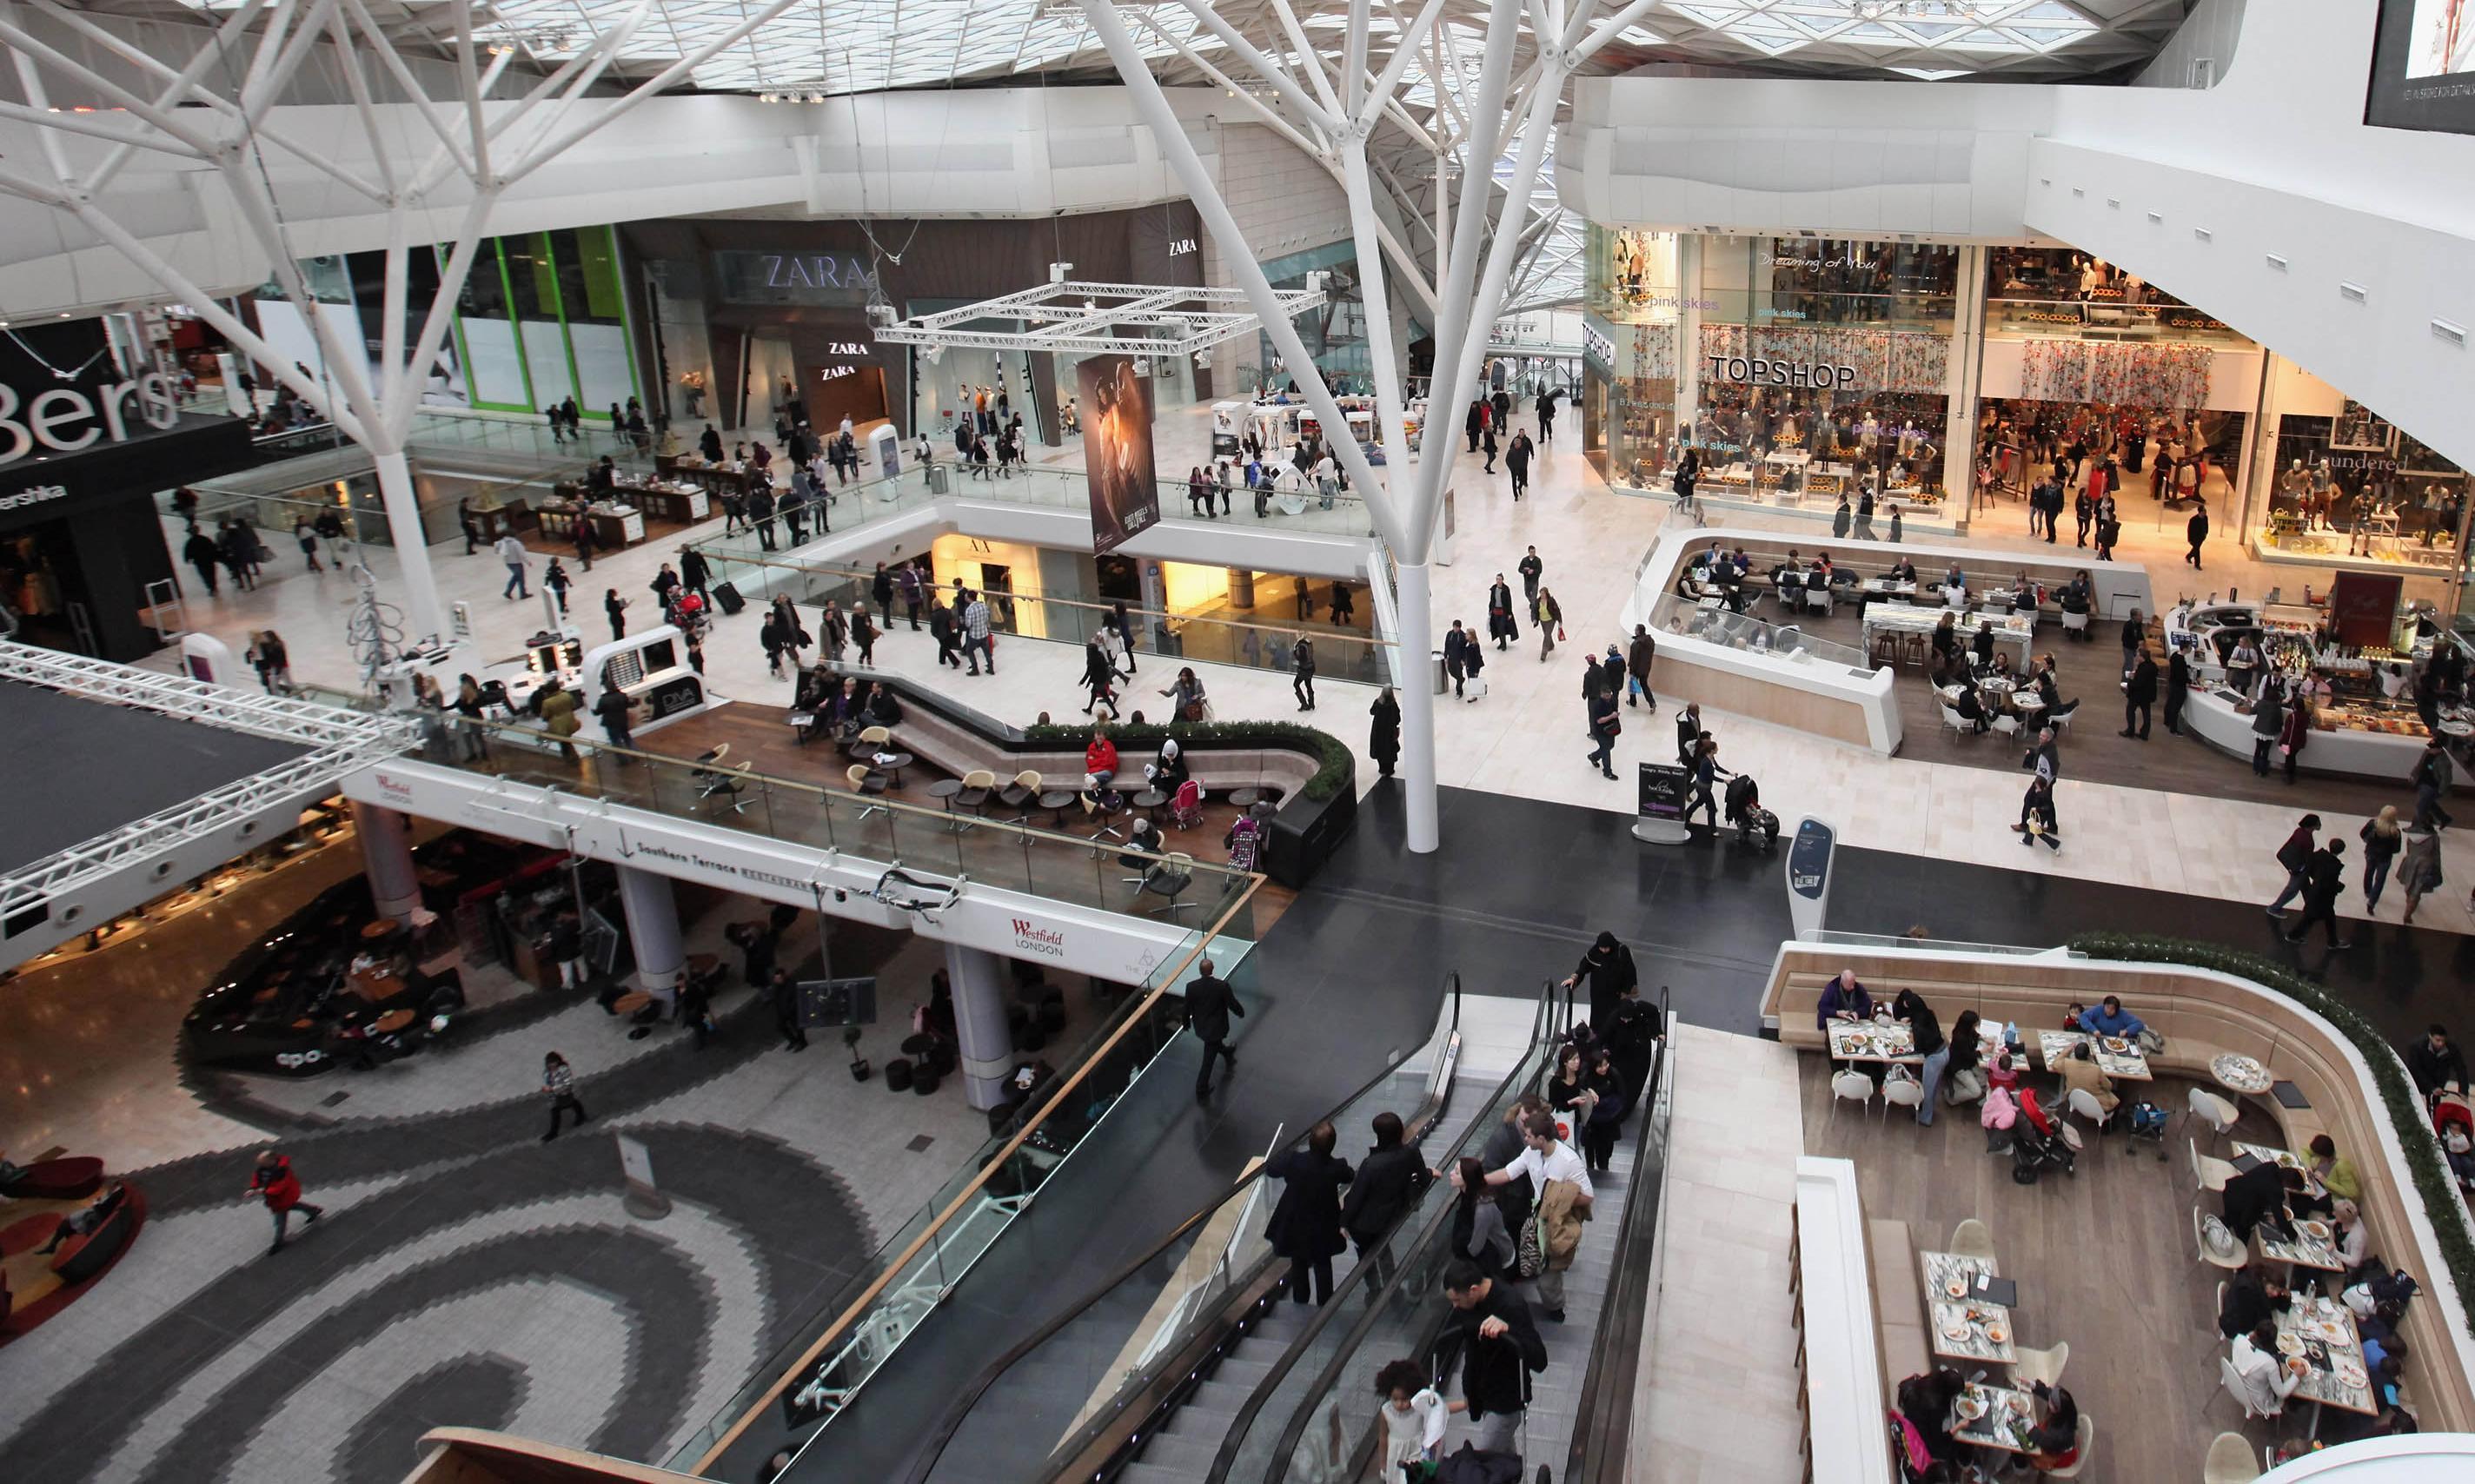 UK retail footfall dips further as shoppers shun high street